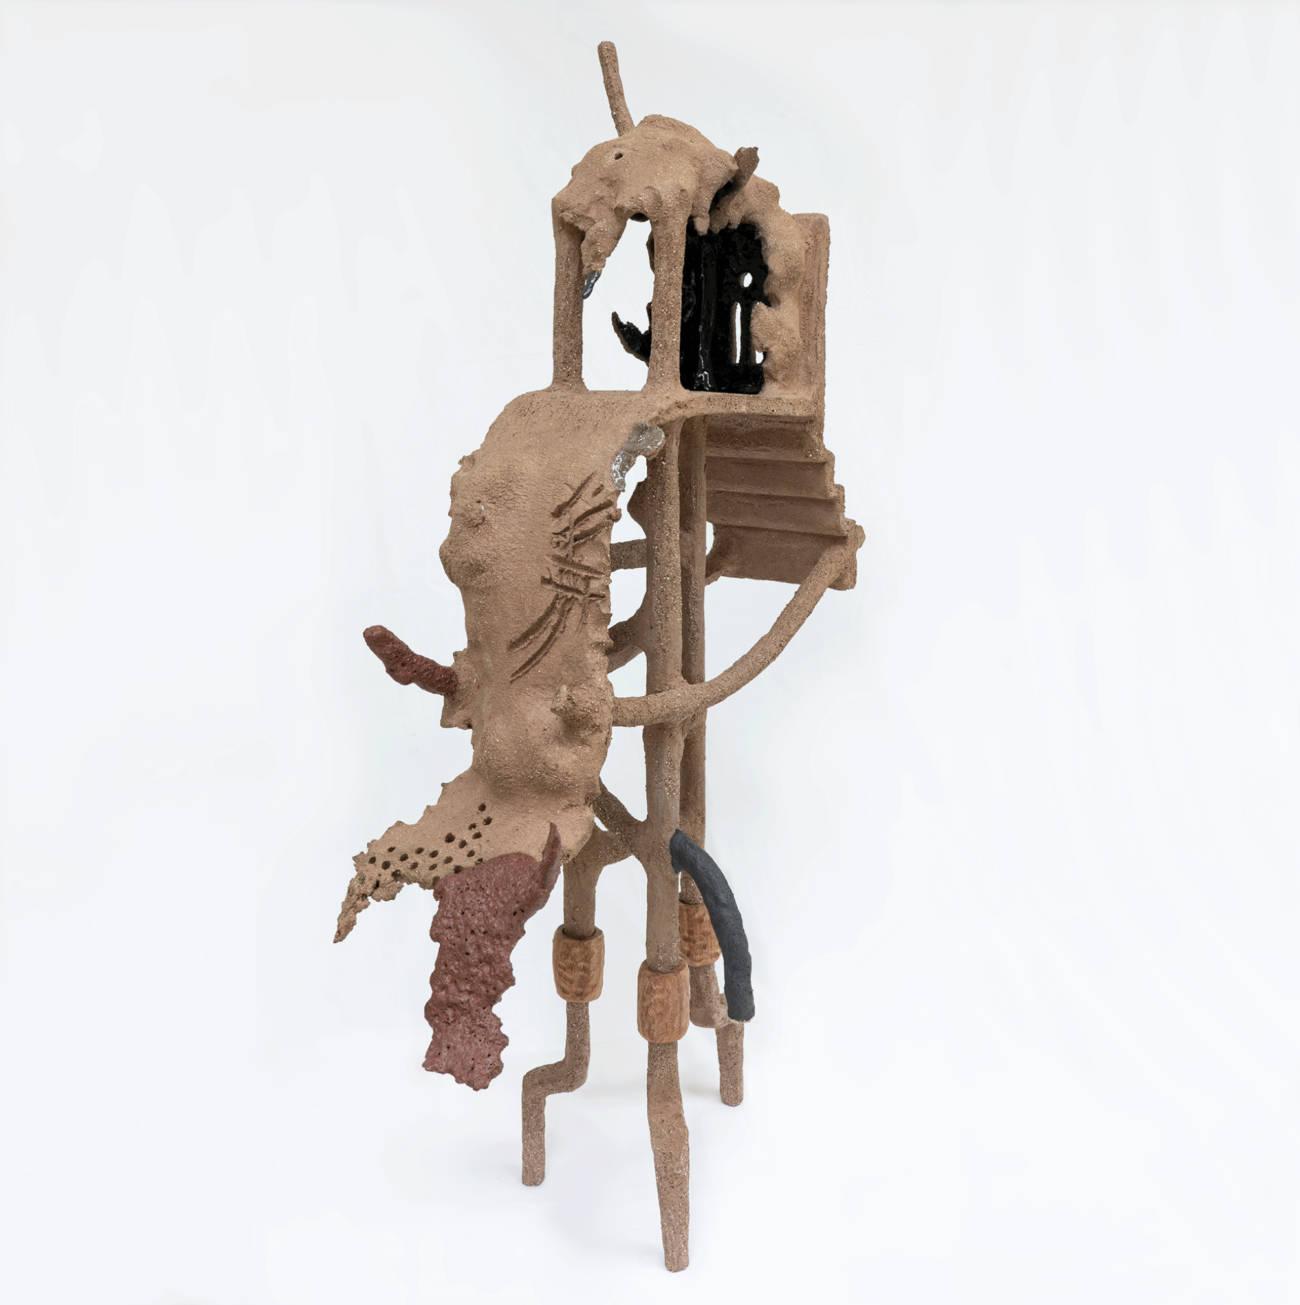 Gautier Ferrero, Swara, 2020, Céramique. Courtesy de l'artiste et de la galerie Catherine Issert